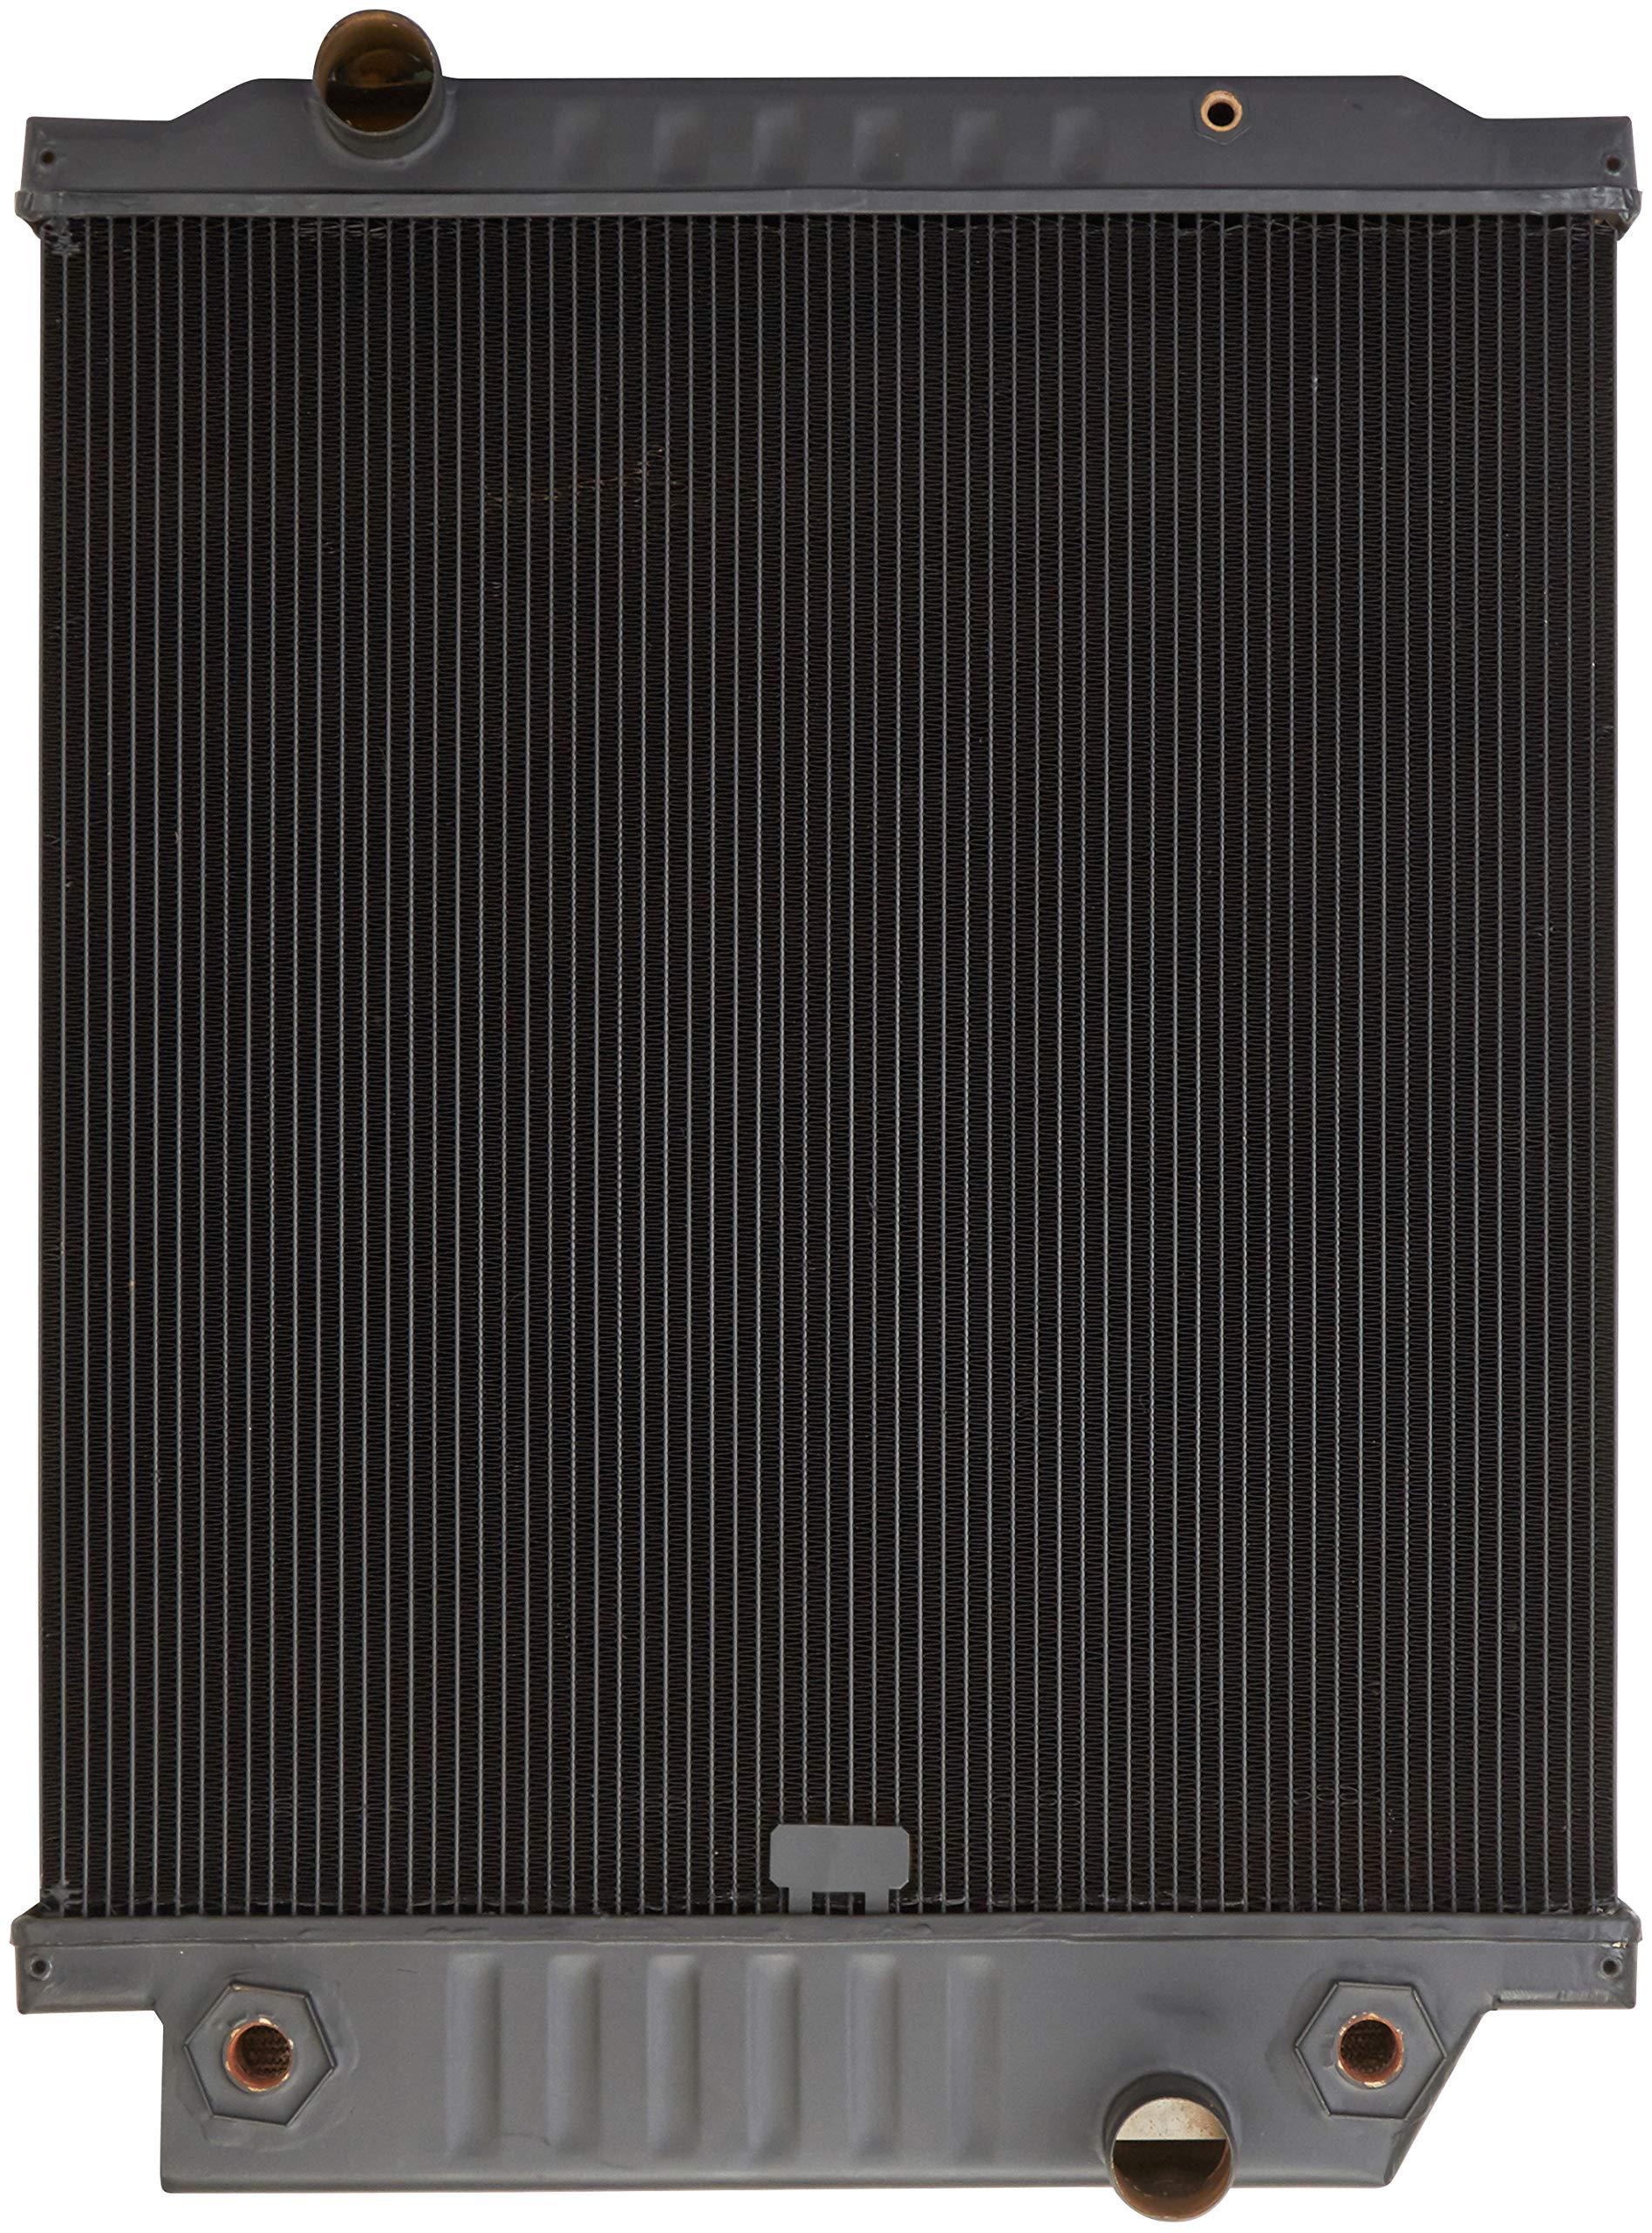 Spectra Premium 2001-1720 Industrial Complete Radiator by Spectra Premium